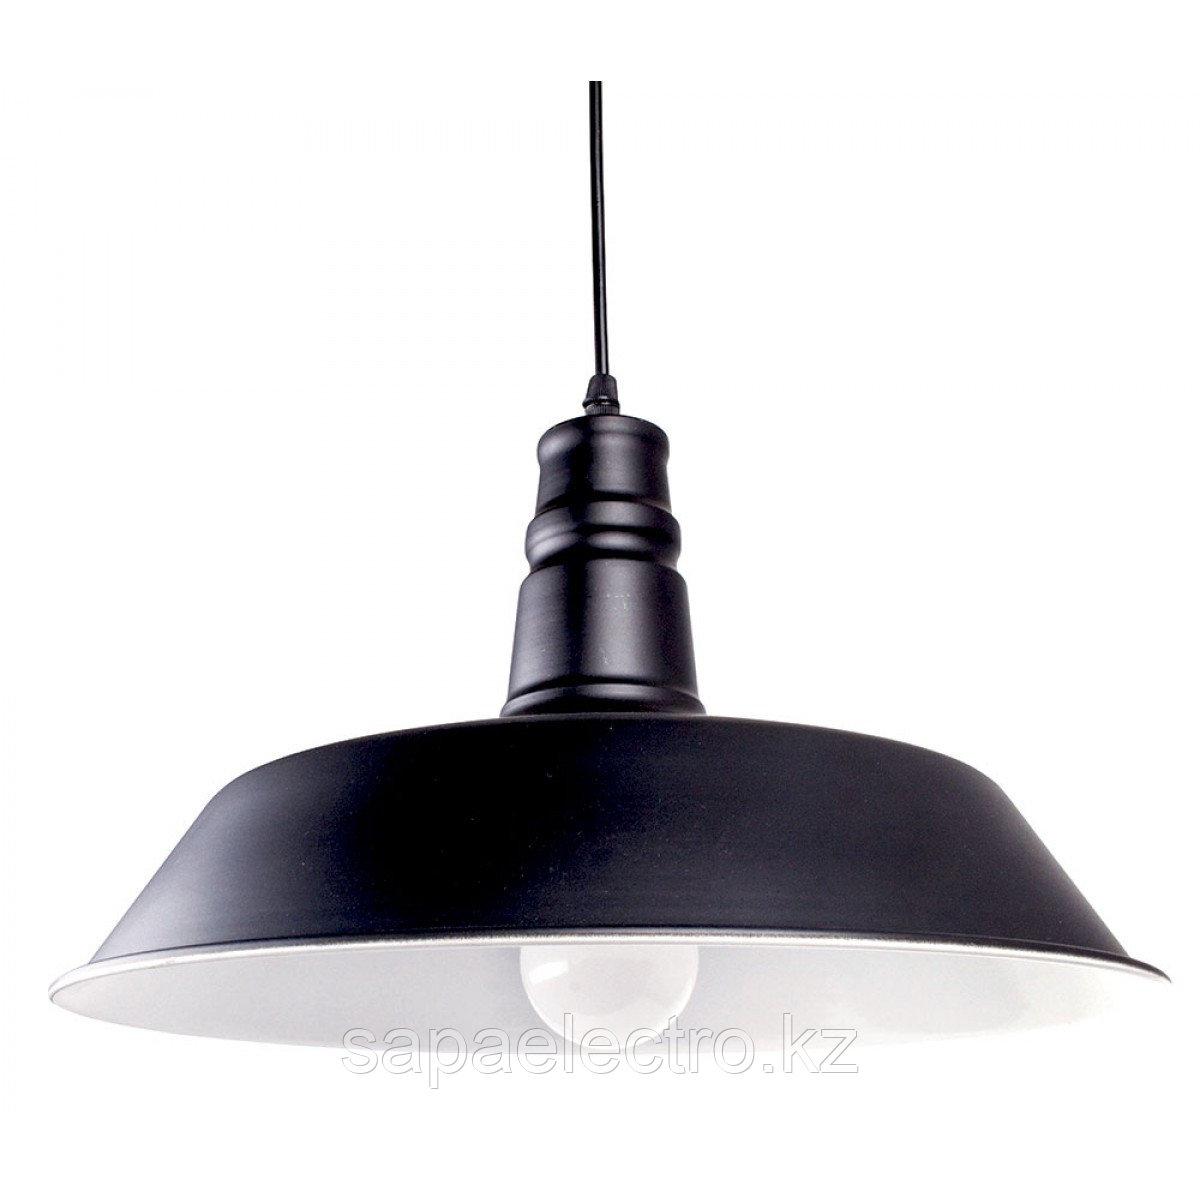 Свет-к  6015  E27 40W BLACK TEKSAN (6шт)